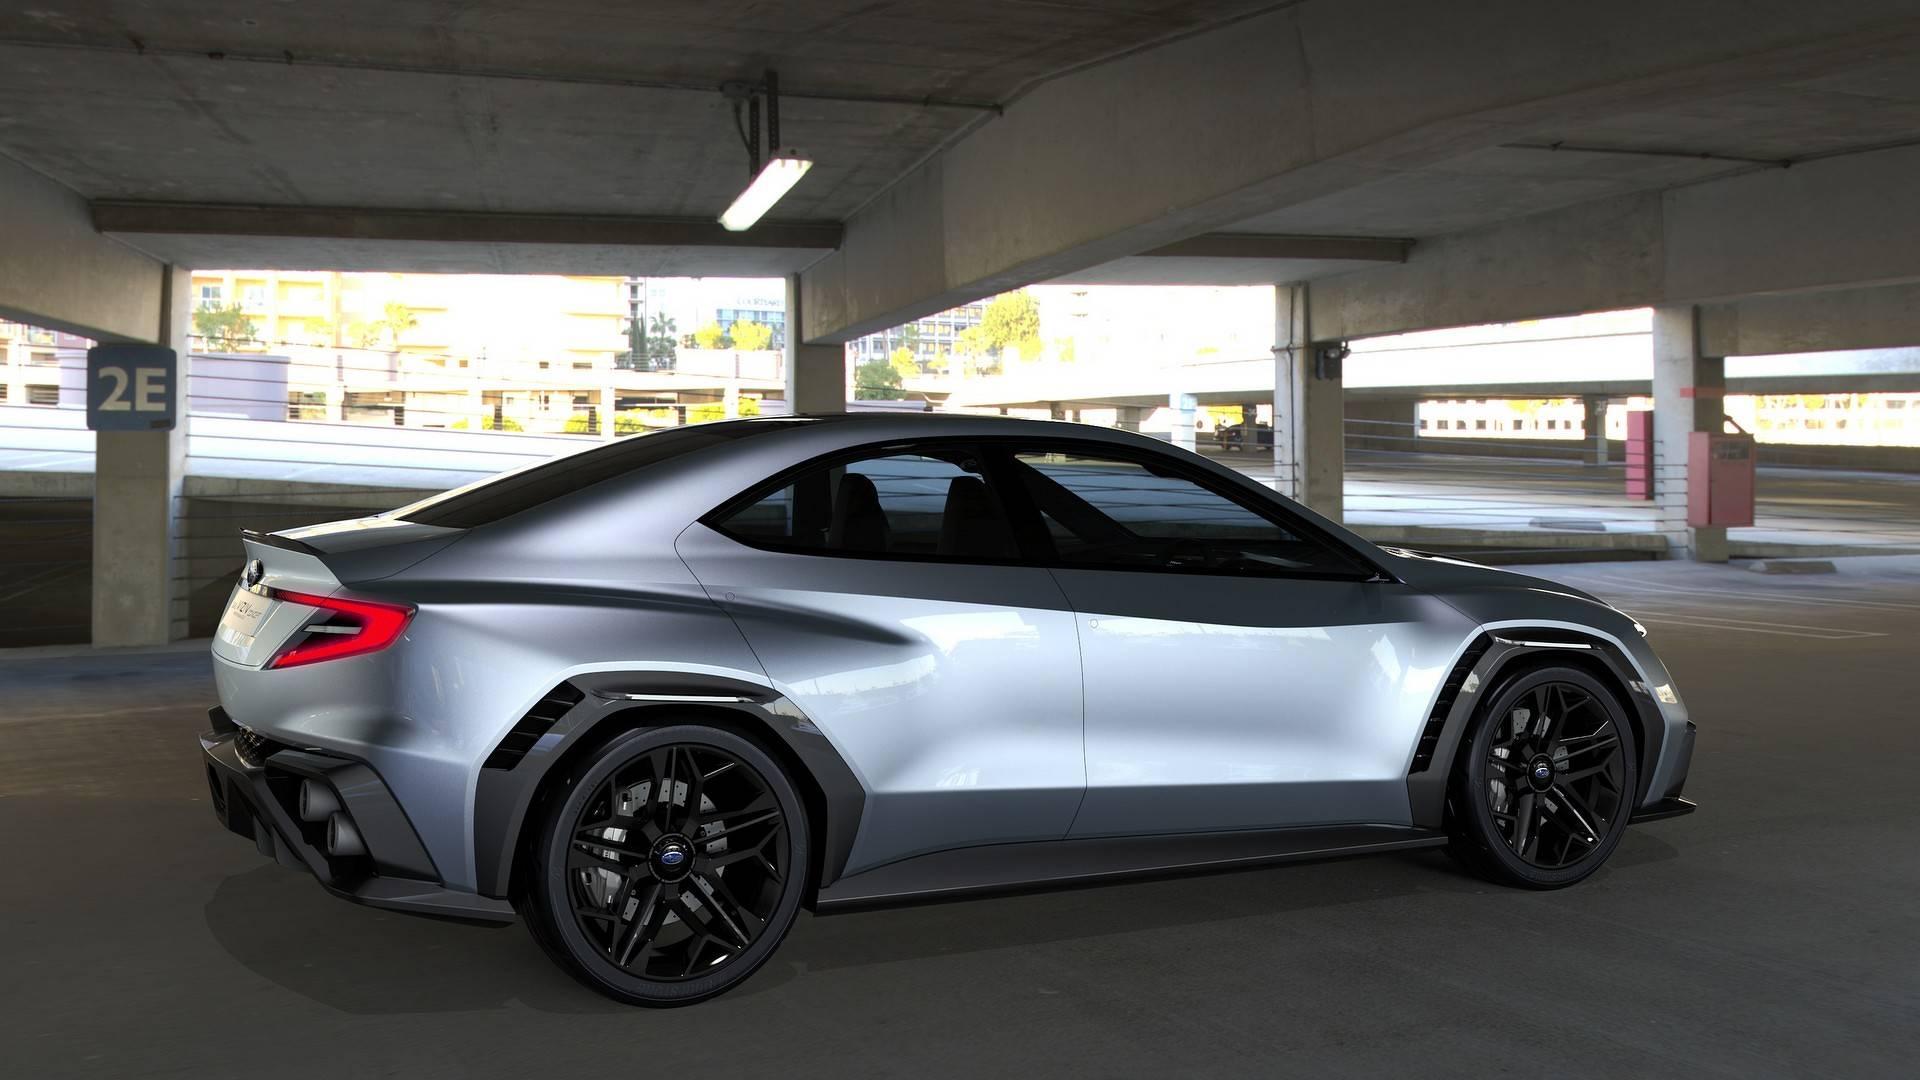 Civic Type R Awd >> 2018 Subaru Impreza WRX STI Rendered as a Hatchback - autoevolution